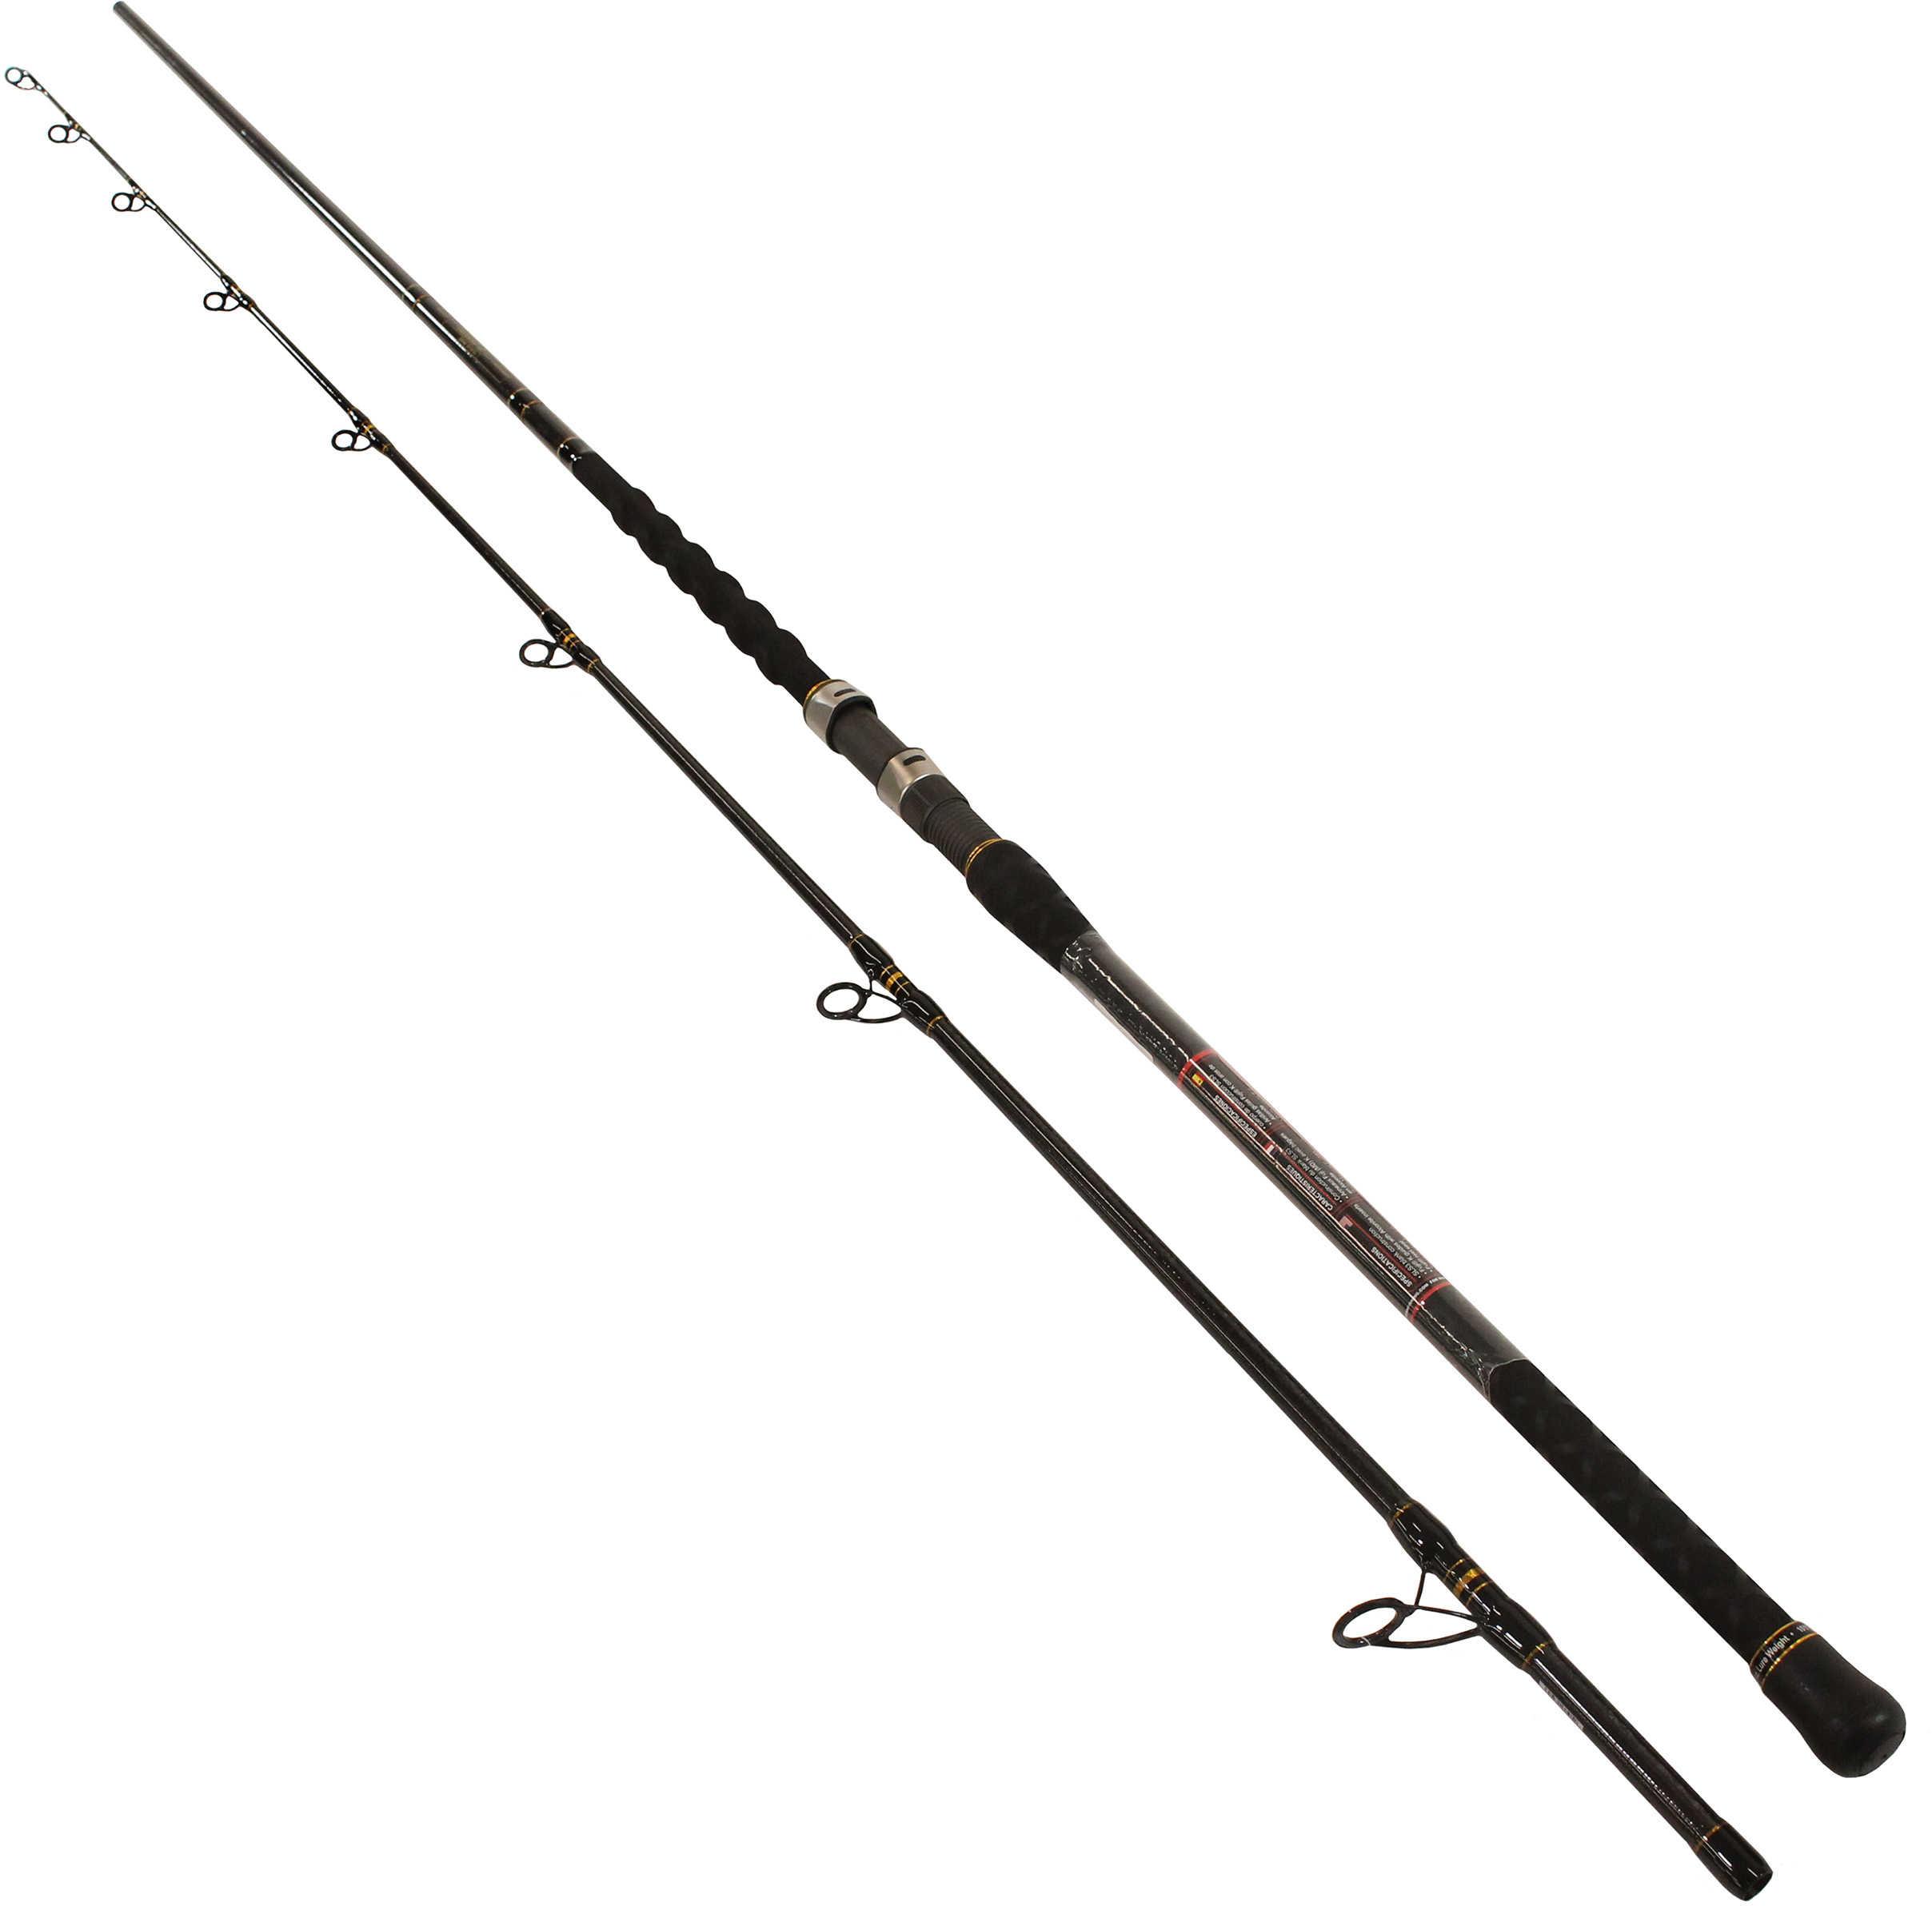 Penn Carnage Ii Surf Spinning Rod 10 Length 2 Piece Rod